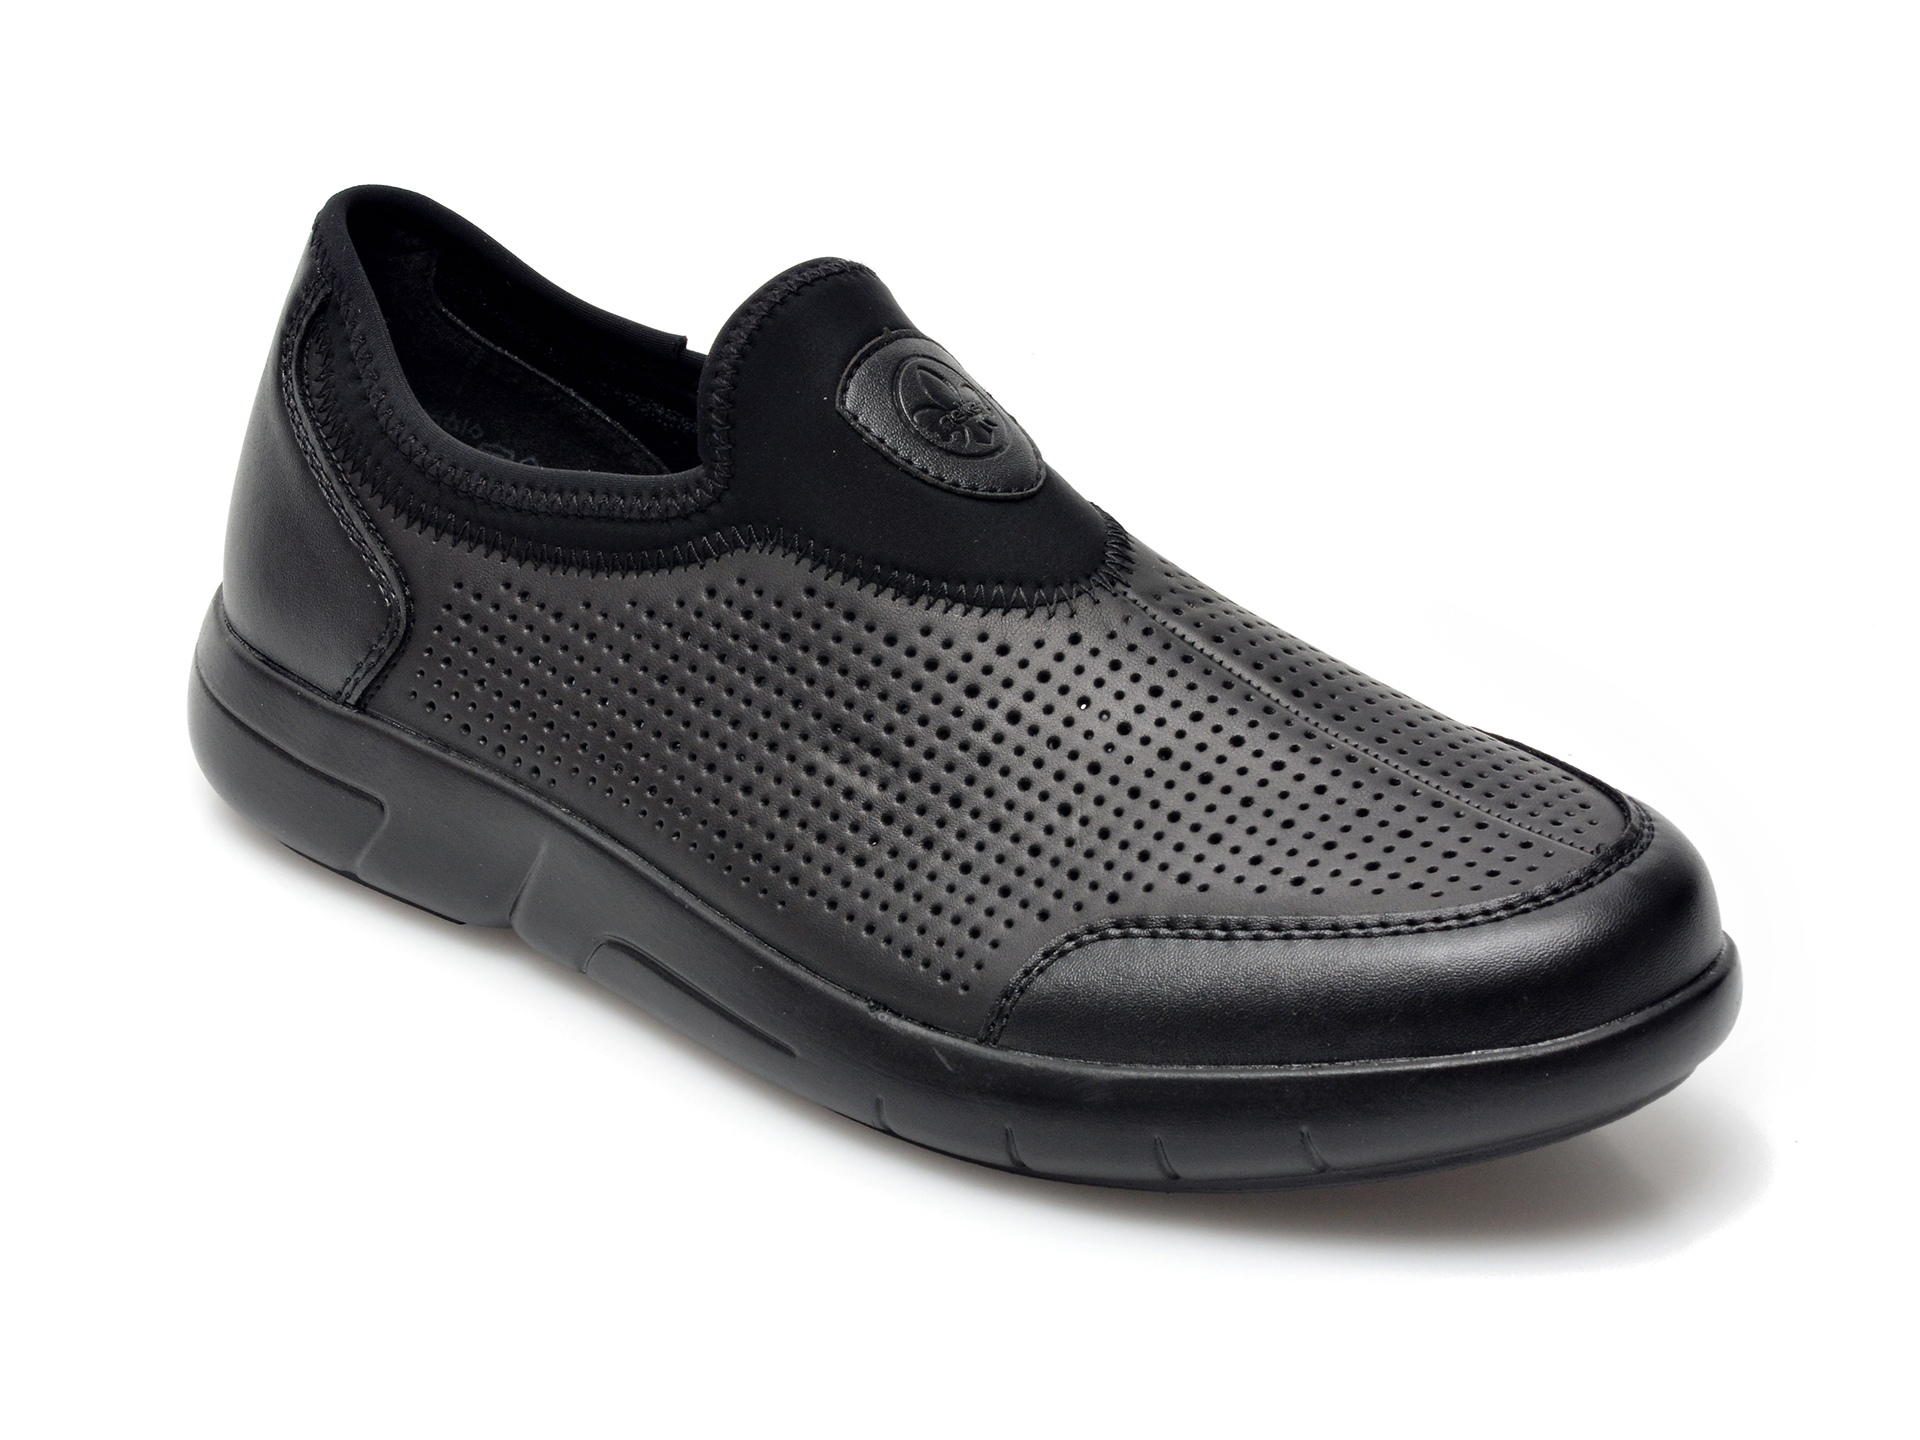 Pantofi RIEKER negri, B2767, din piele ecologica